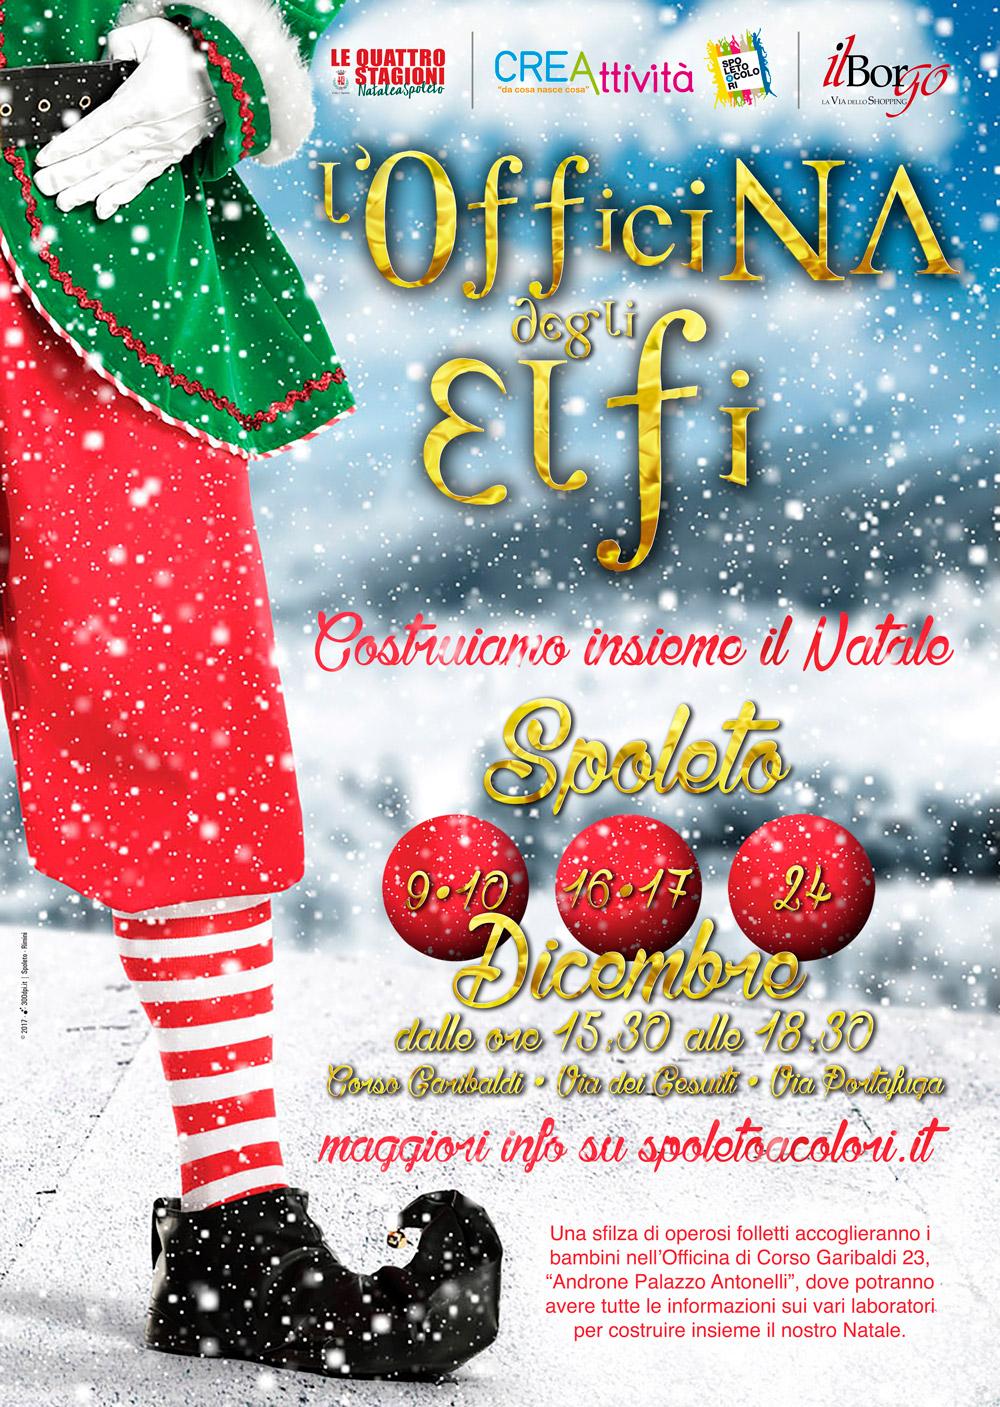 L'Officina degli Elfi - Locandina - Spoleto 2017